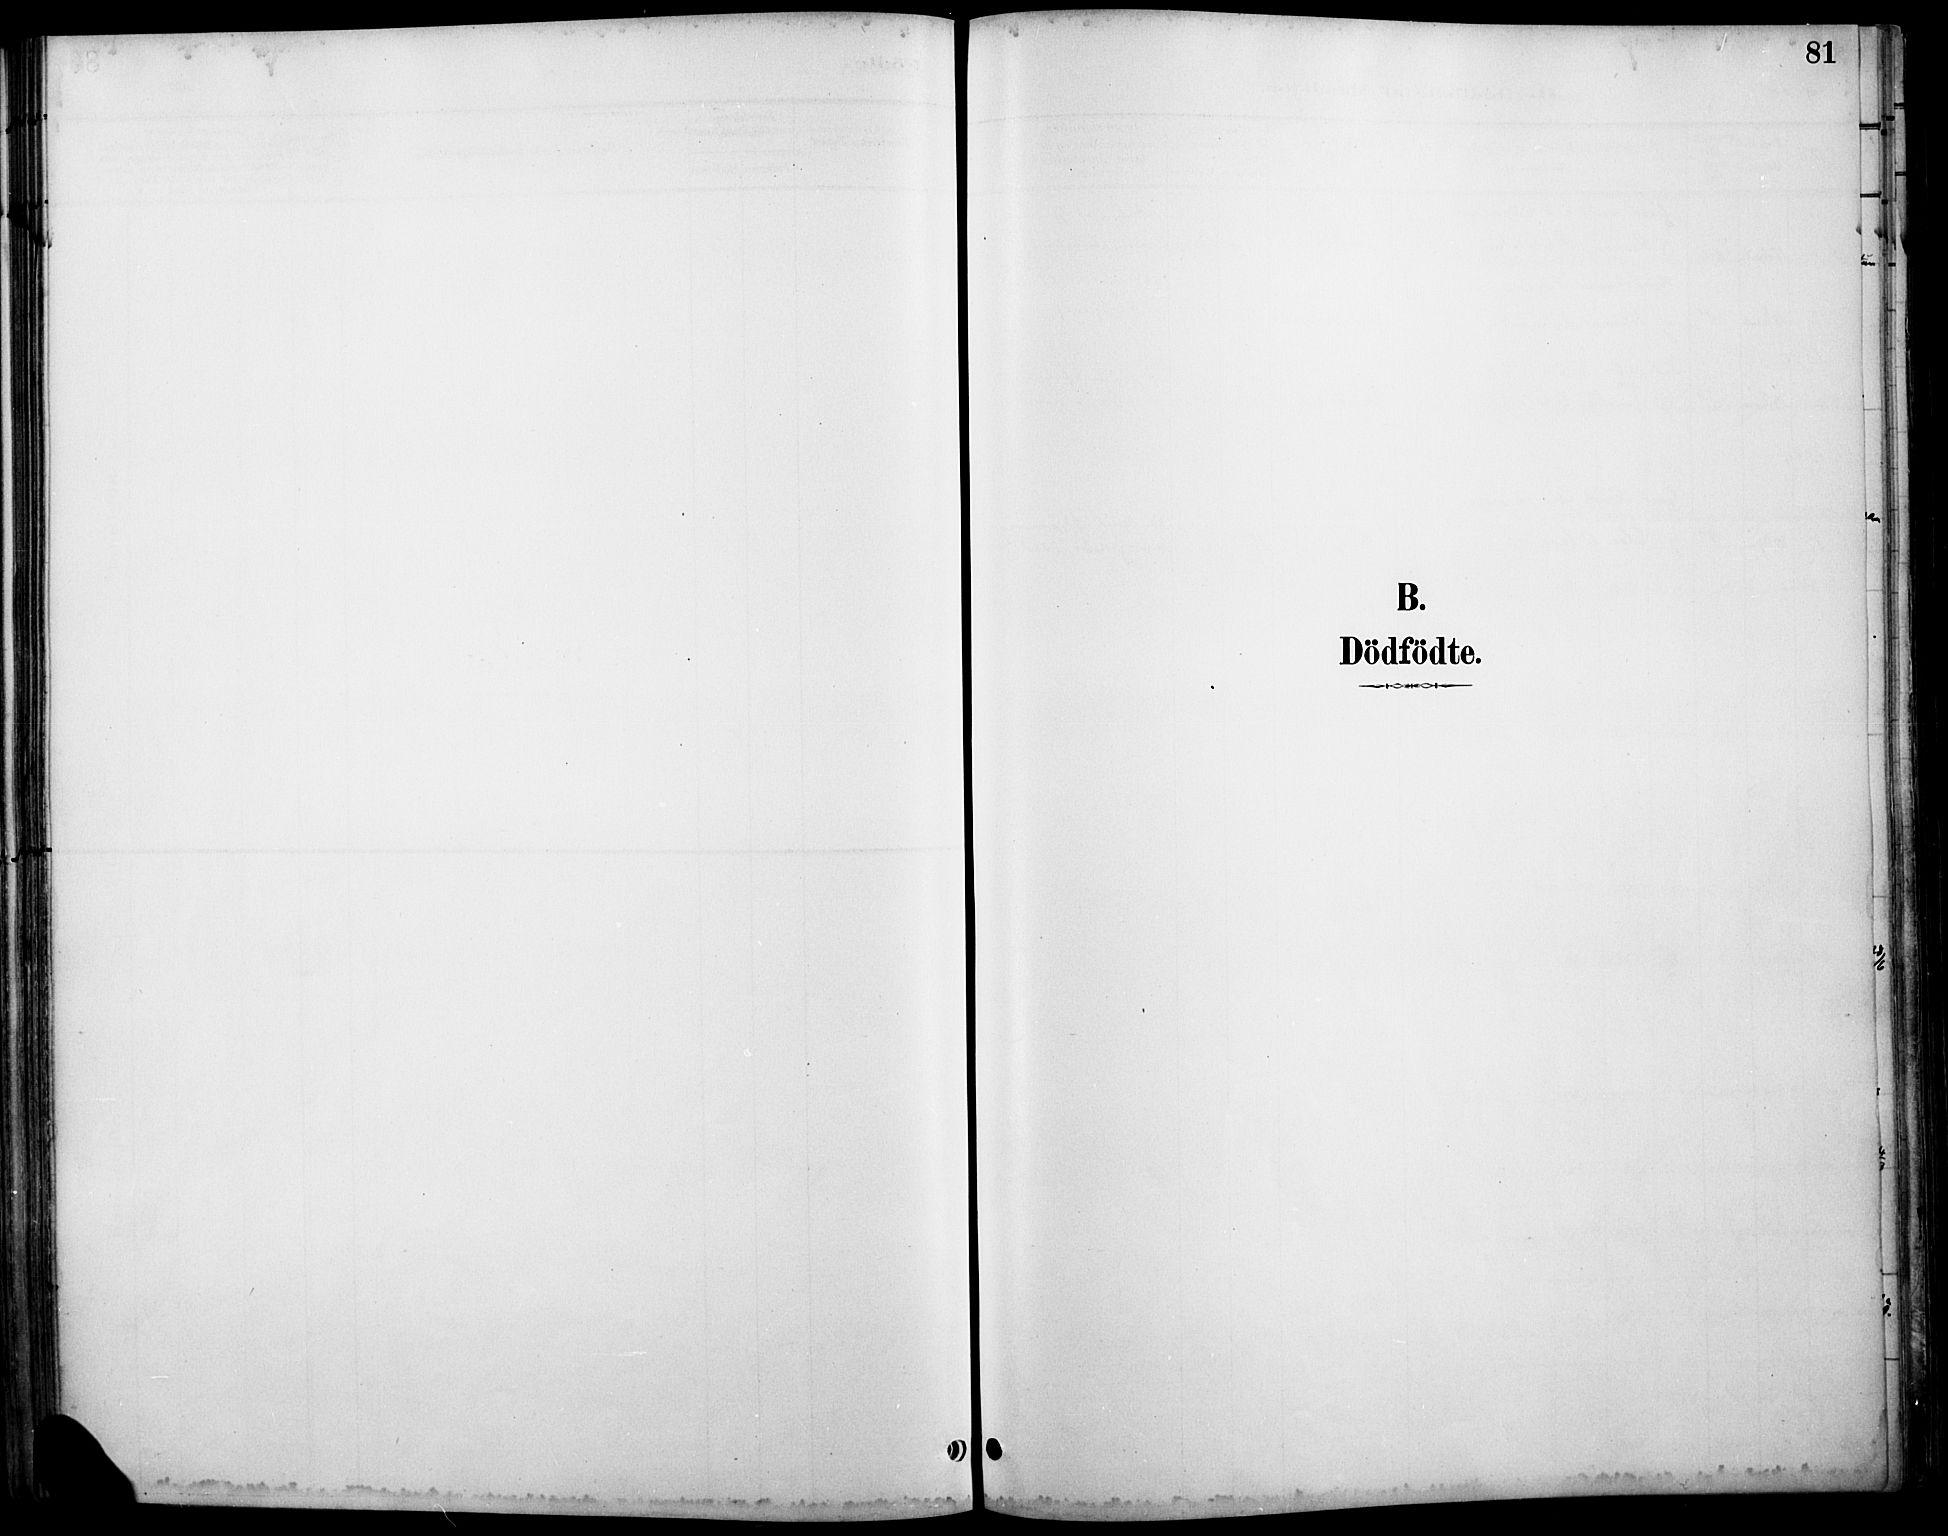 SAH, Østre Gausdal prestekontor, Ministerialbok nr. 2, 1887-1897, s. 81